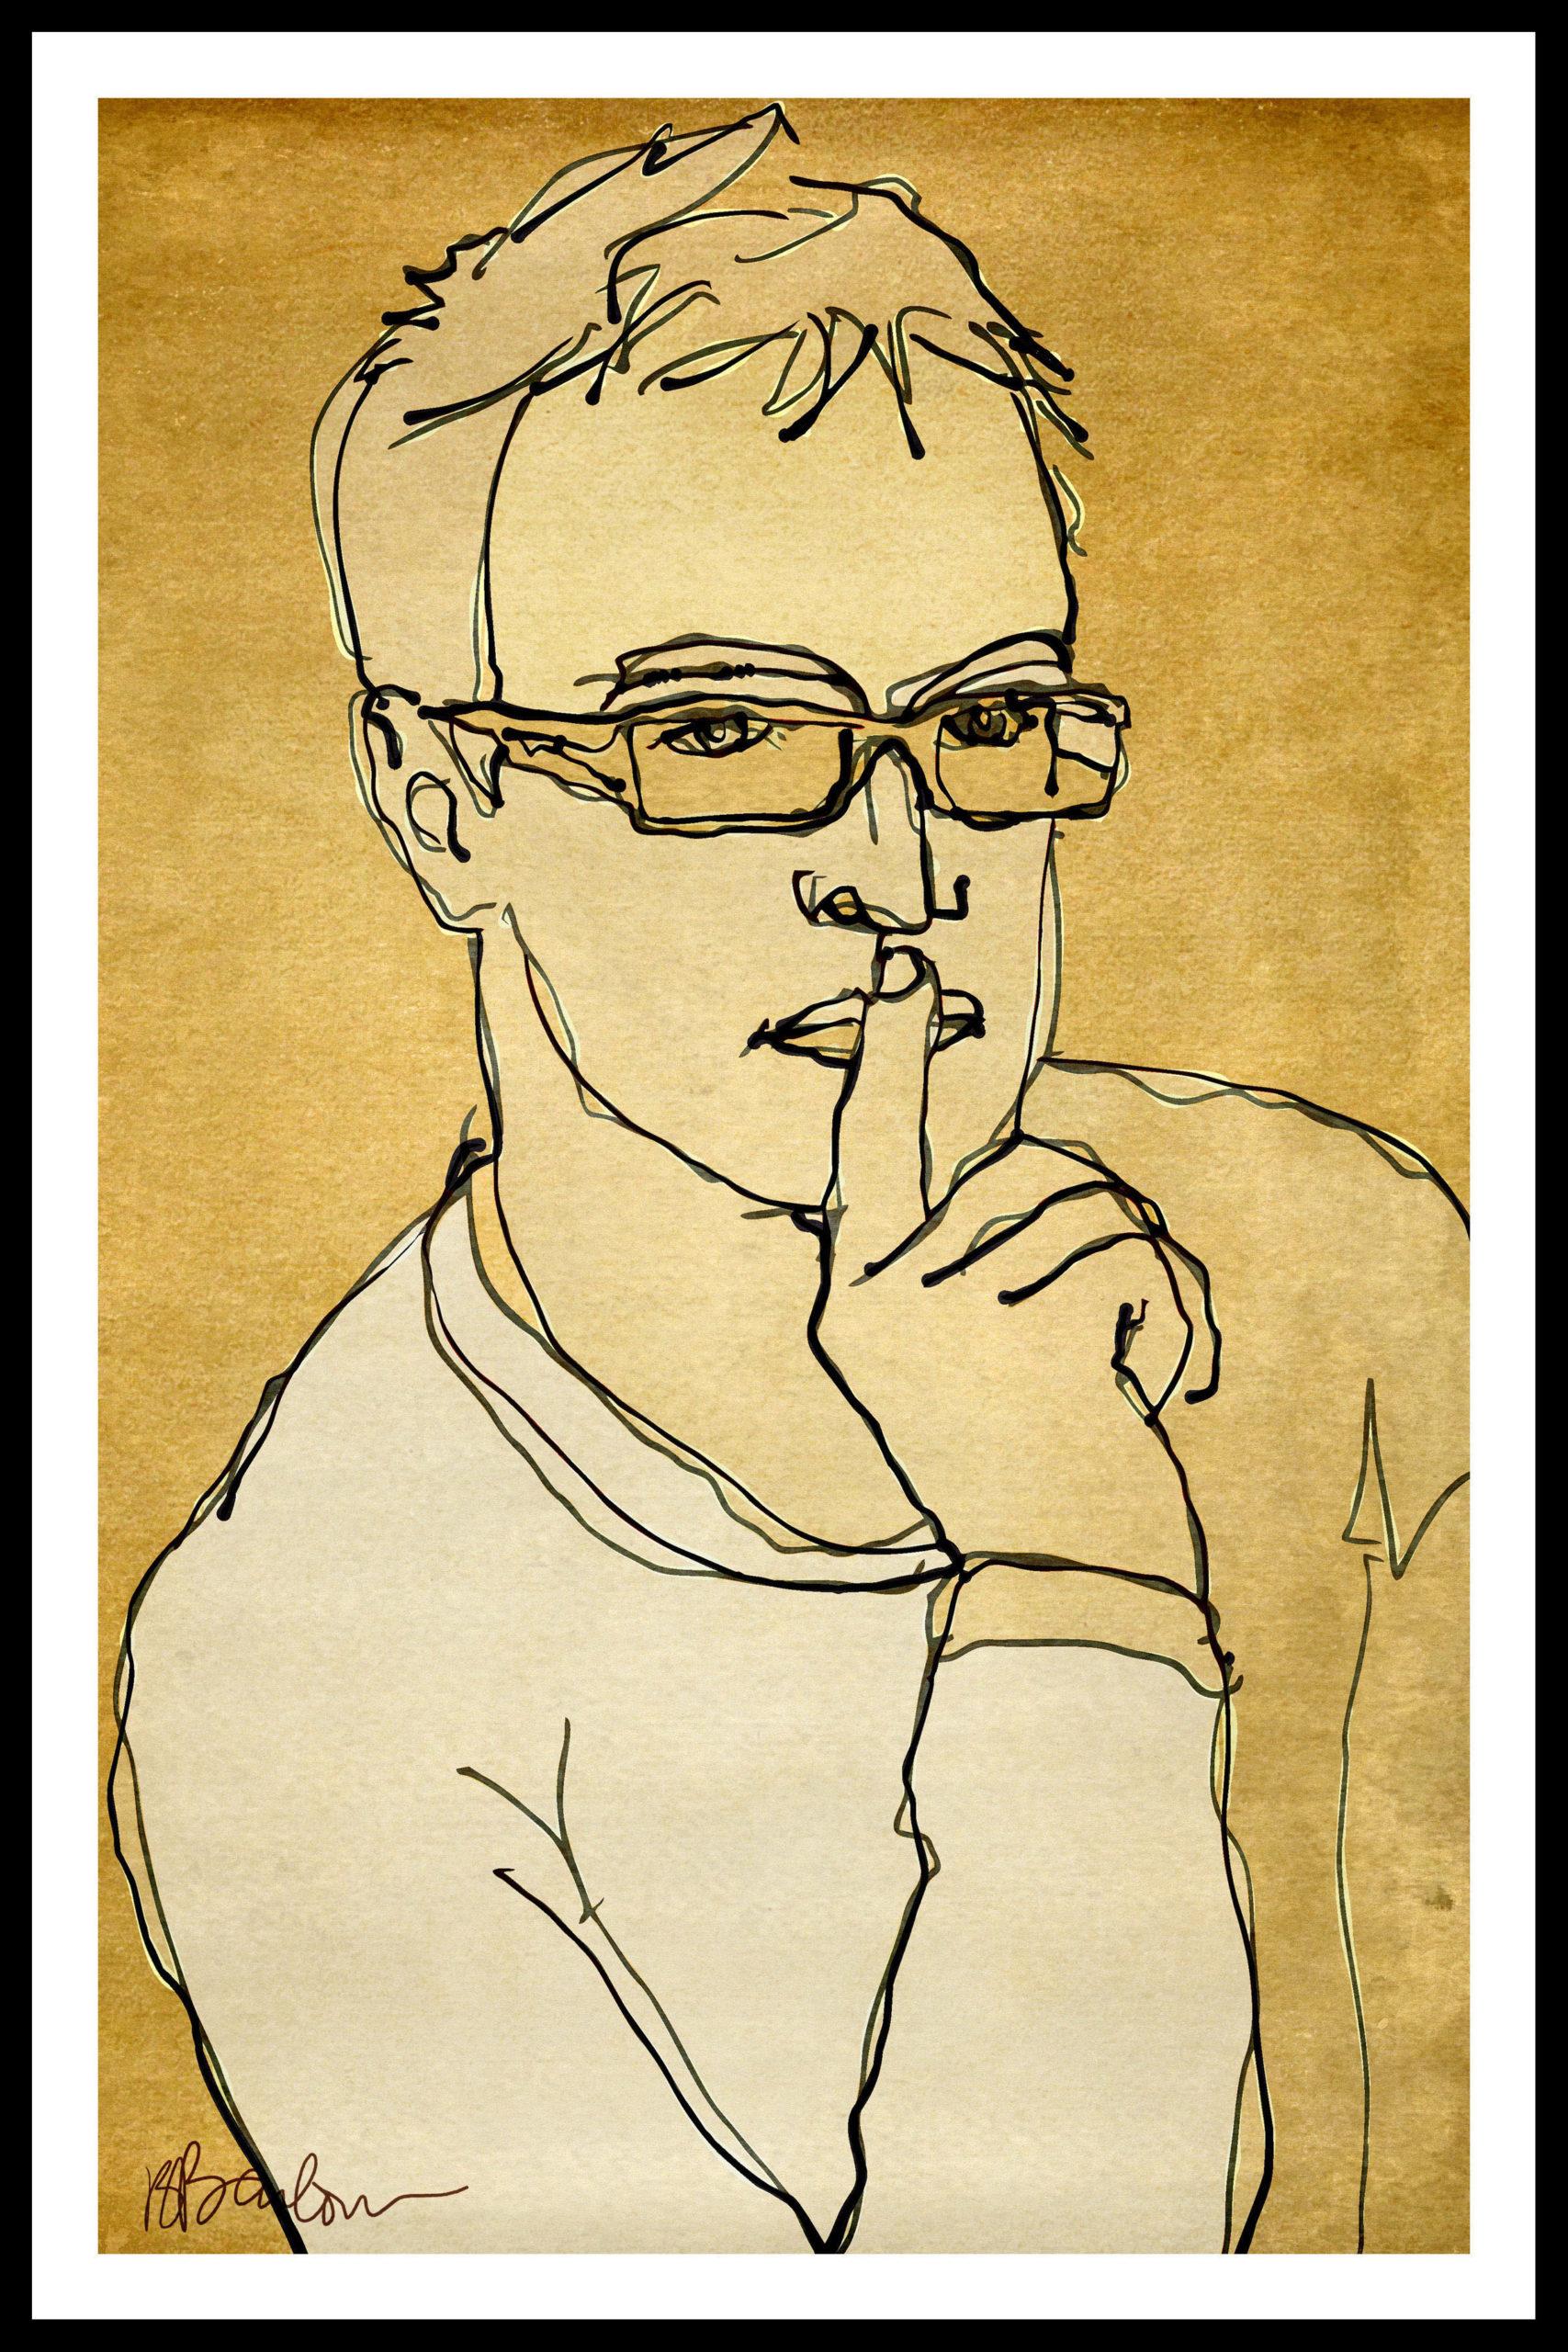 Martin by Bill Barlow